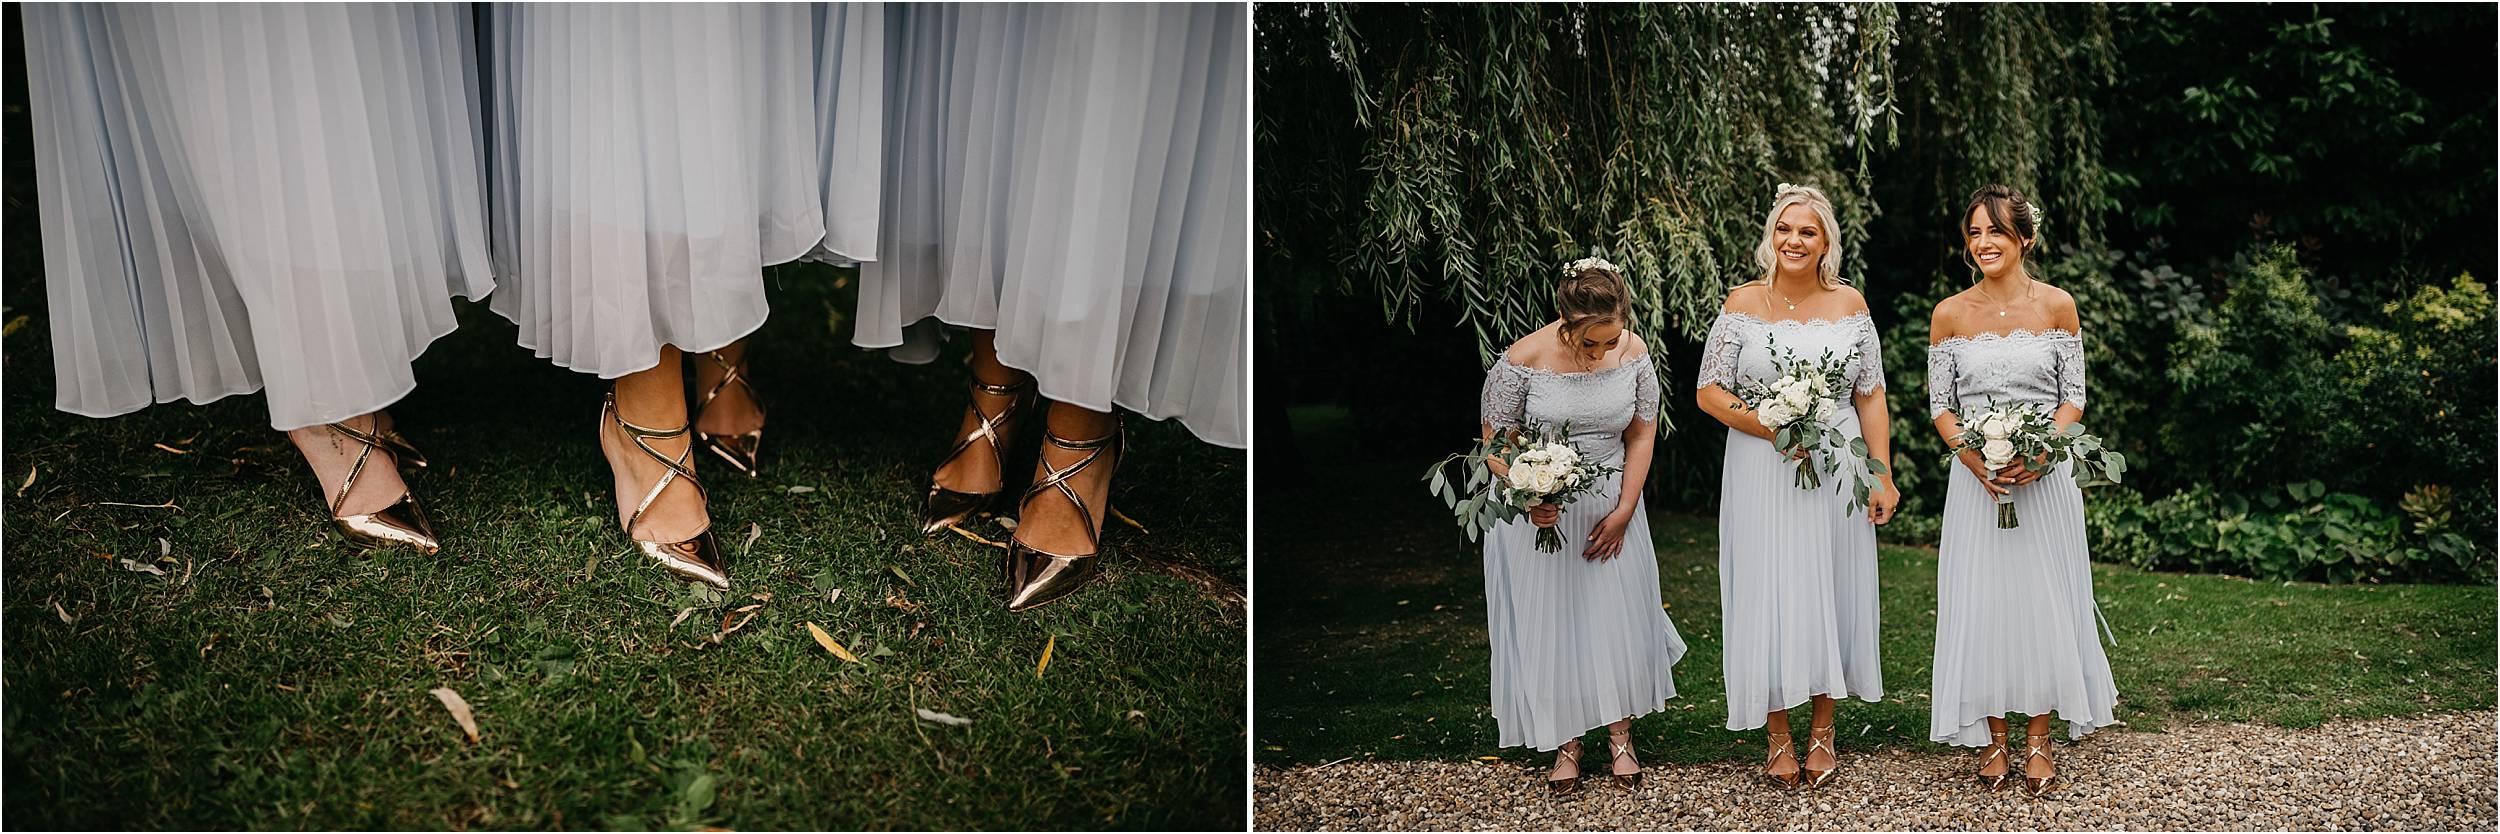 The Priory Little Wymondley Wedding Photography_0056.jpg